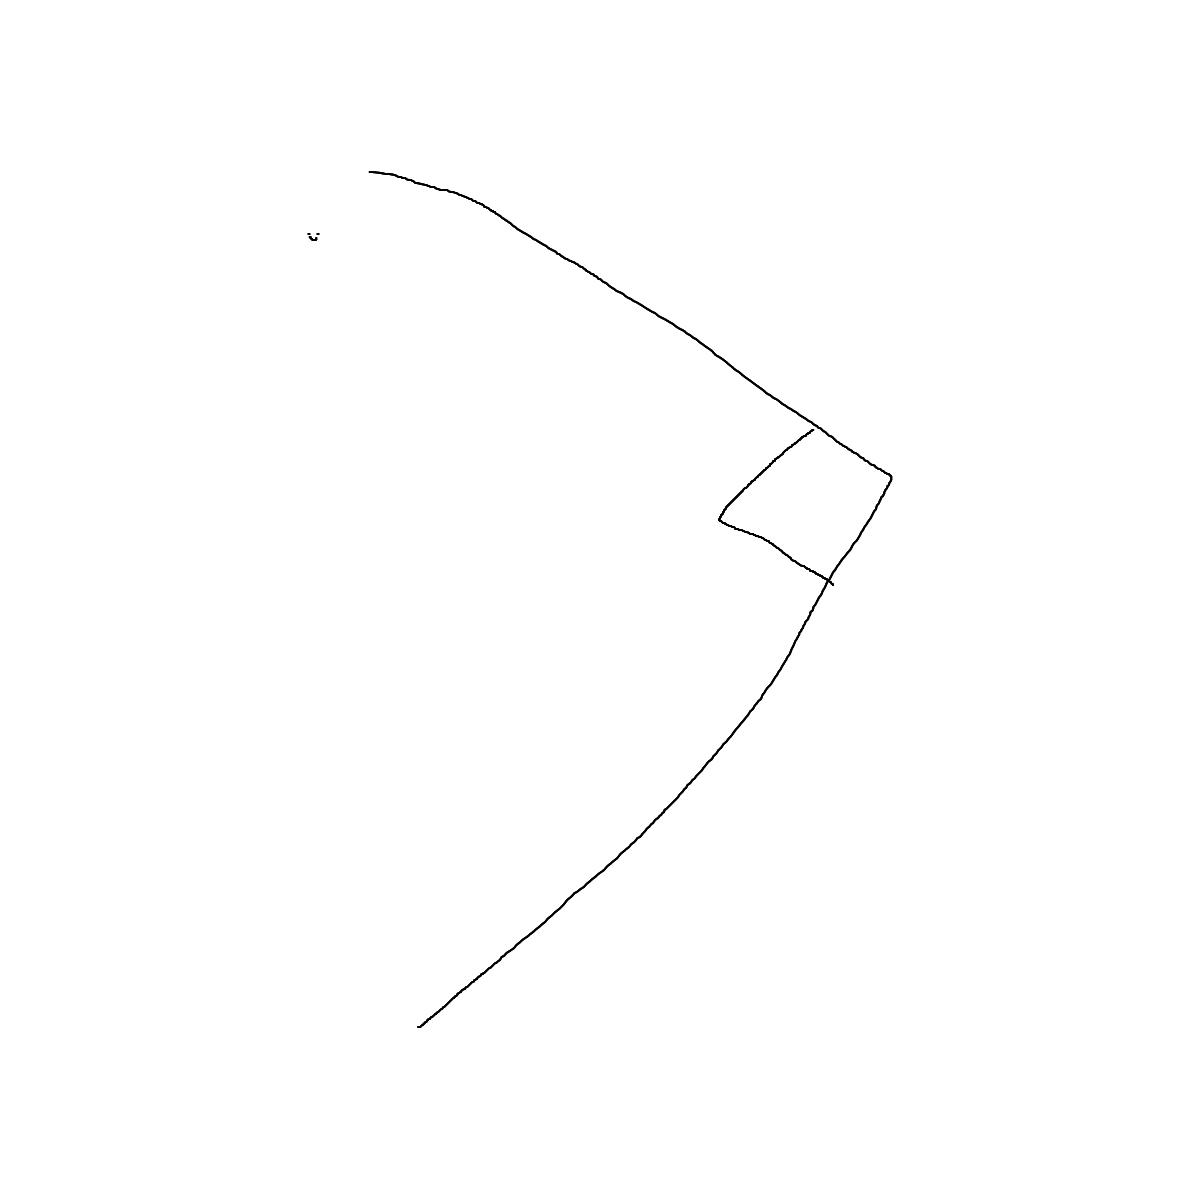 BAAAM drawing#713 lat:-38.1402206420898440lng: 144.3631591796875000